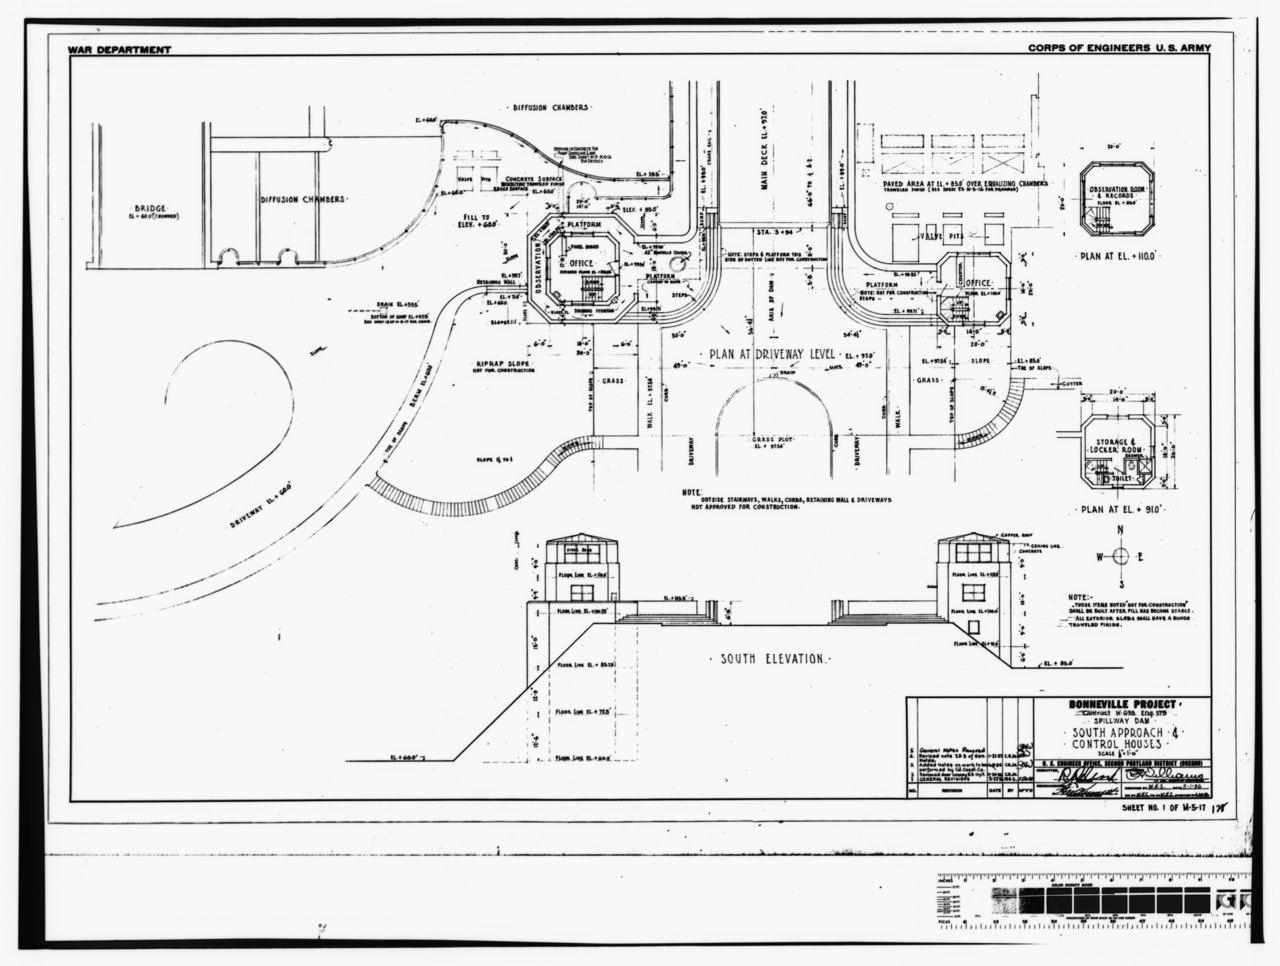 File Photocopy Of Original Construction Drawing 1 May